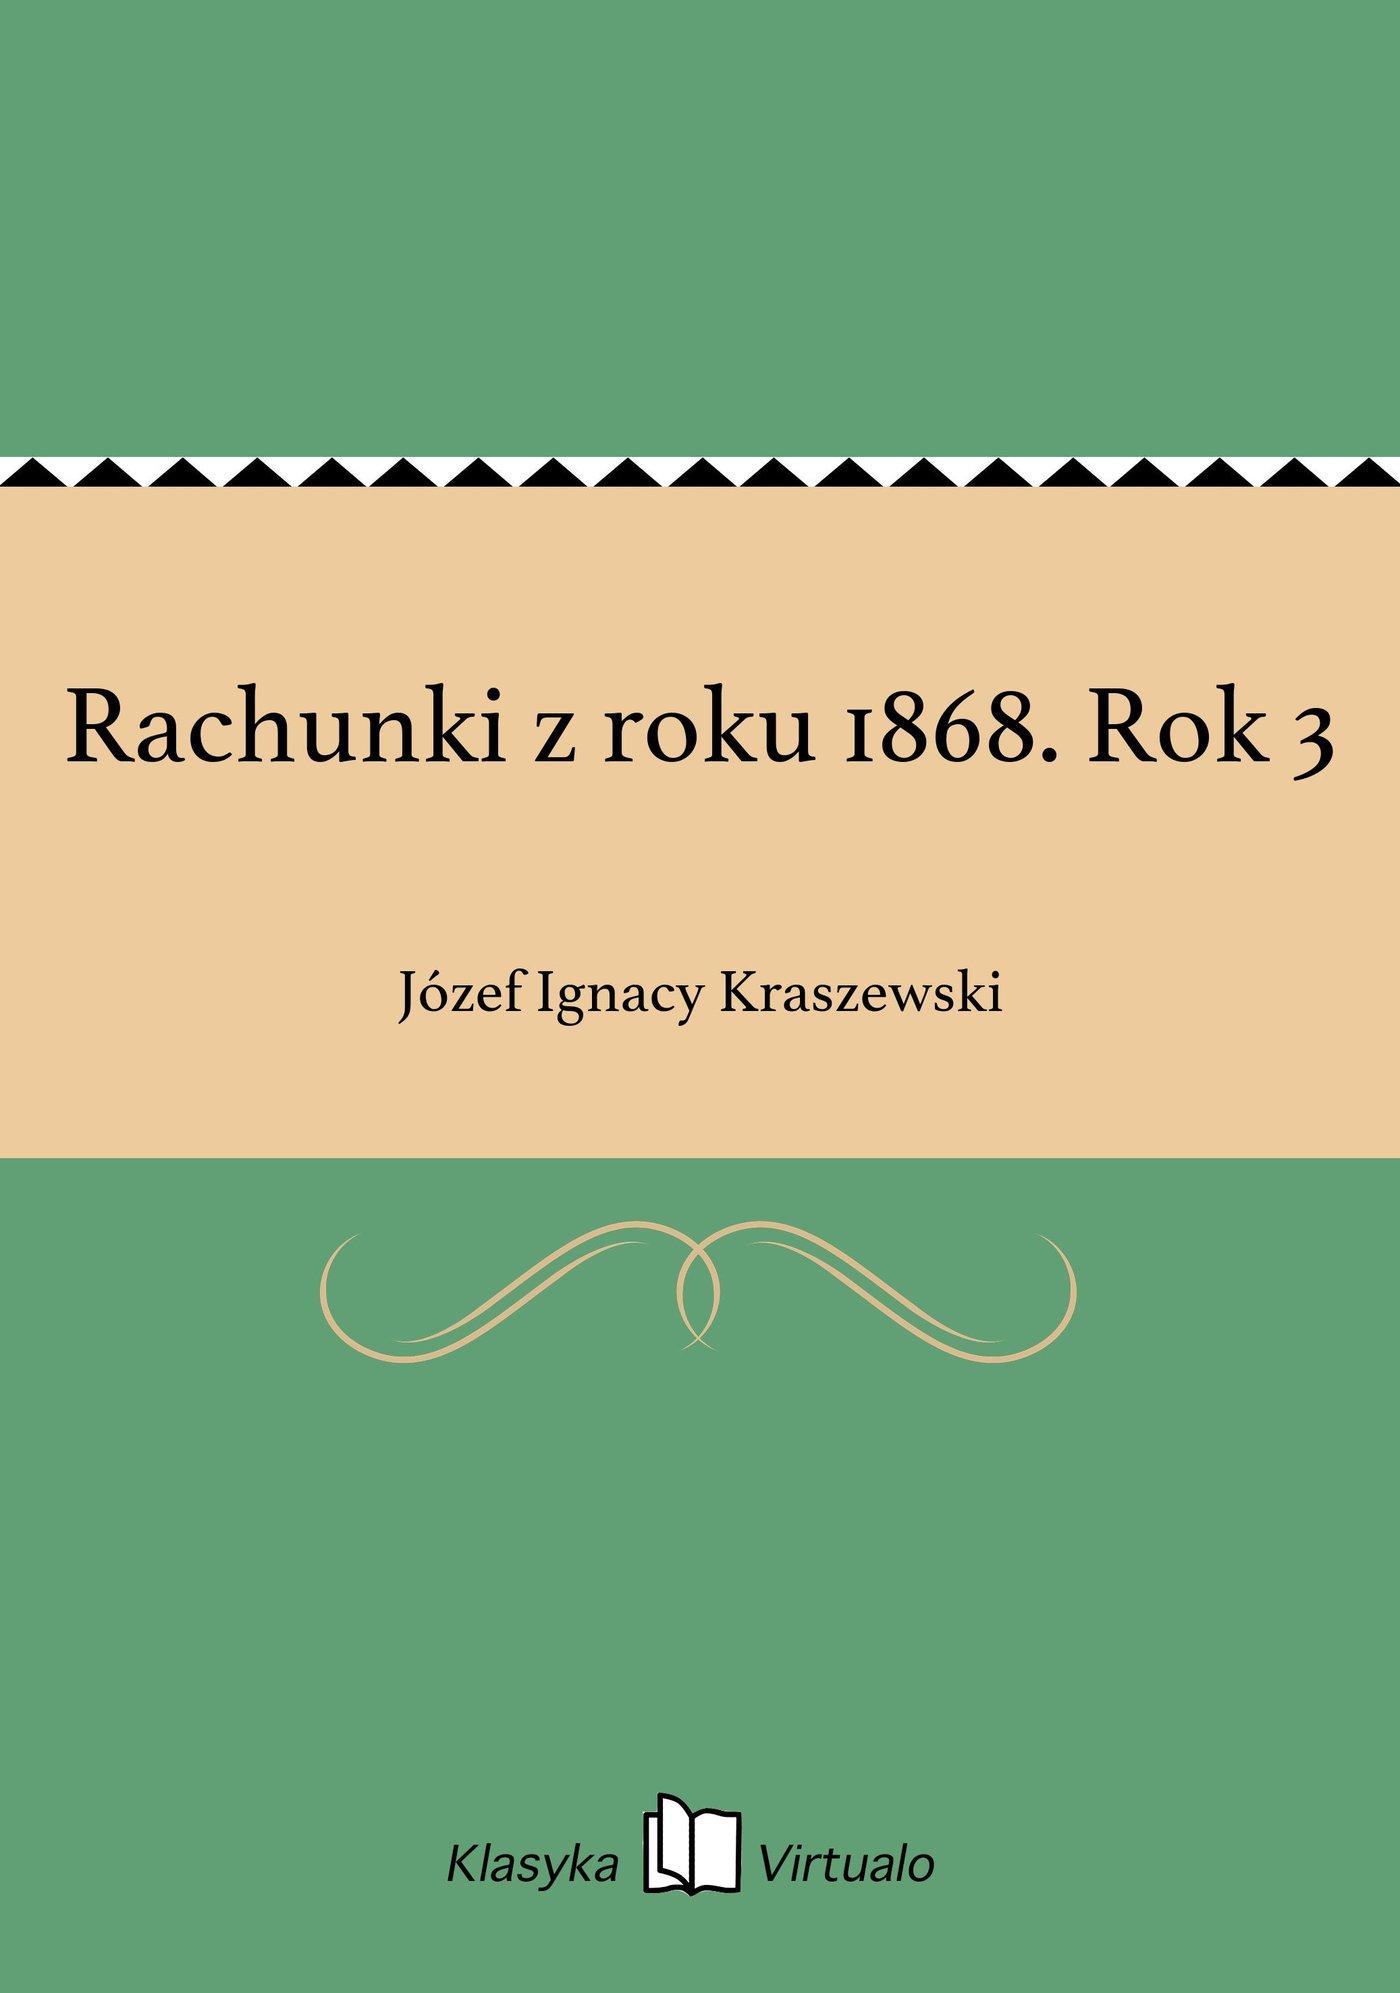 Rachunki z roku 1868. Rok 3 - Ebook (Książka EPUB) do pobrania w formacie EPUB